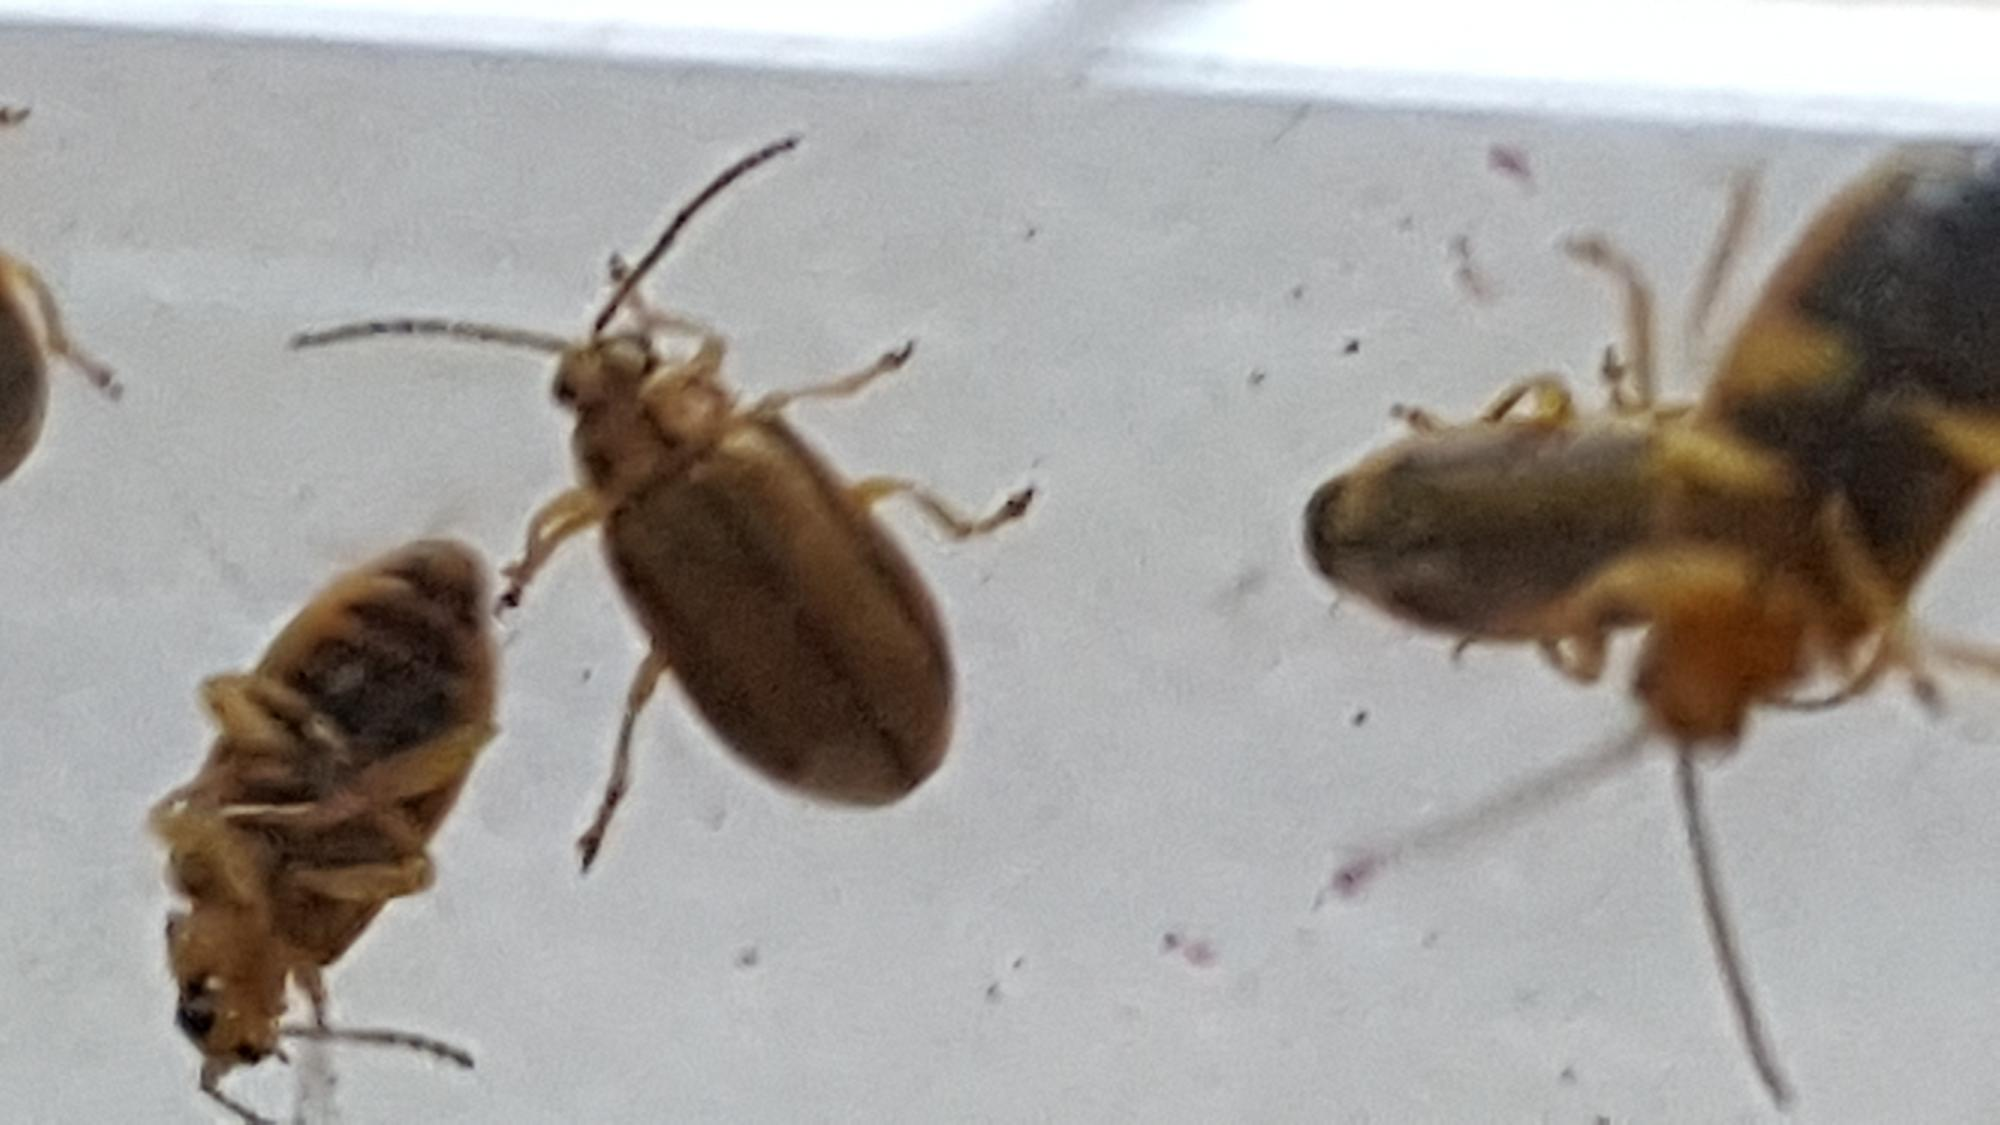 Petit Insecte Beige Marron Volant